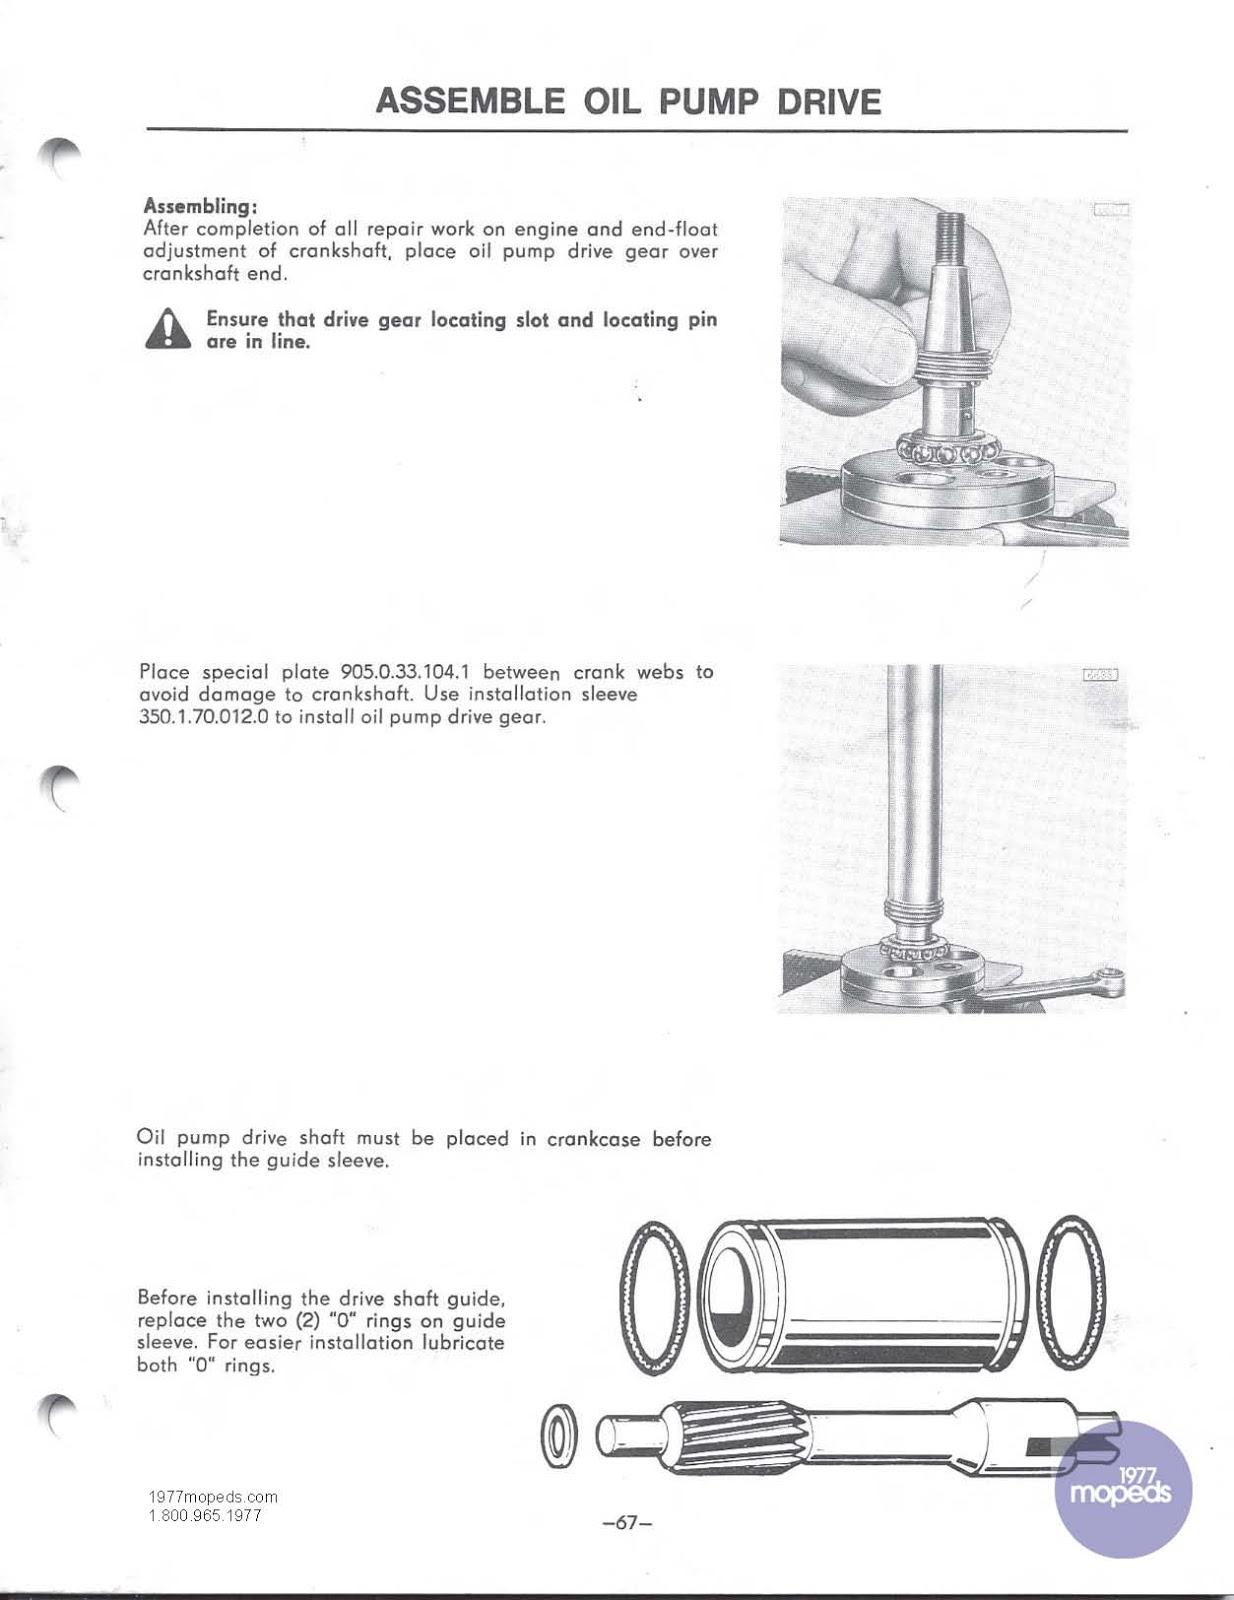 1977 peugeot 103 moped manual